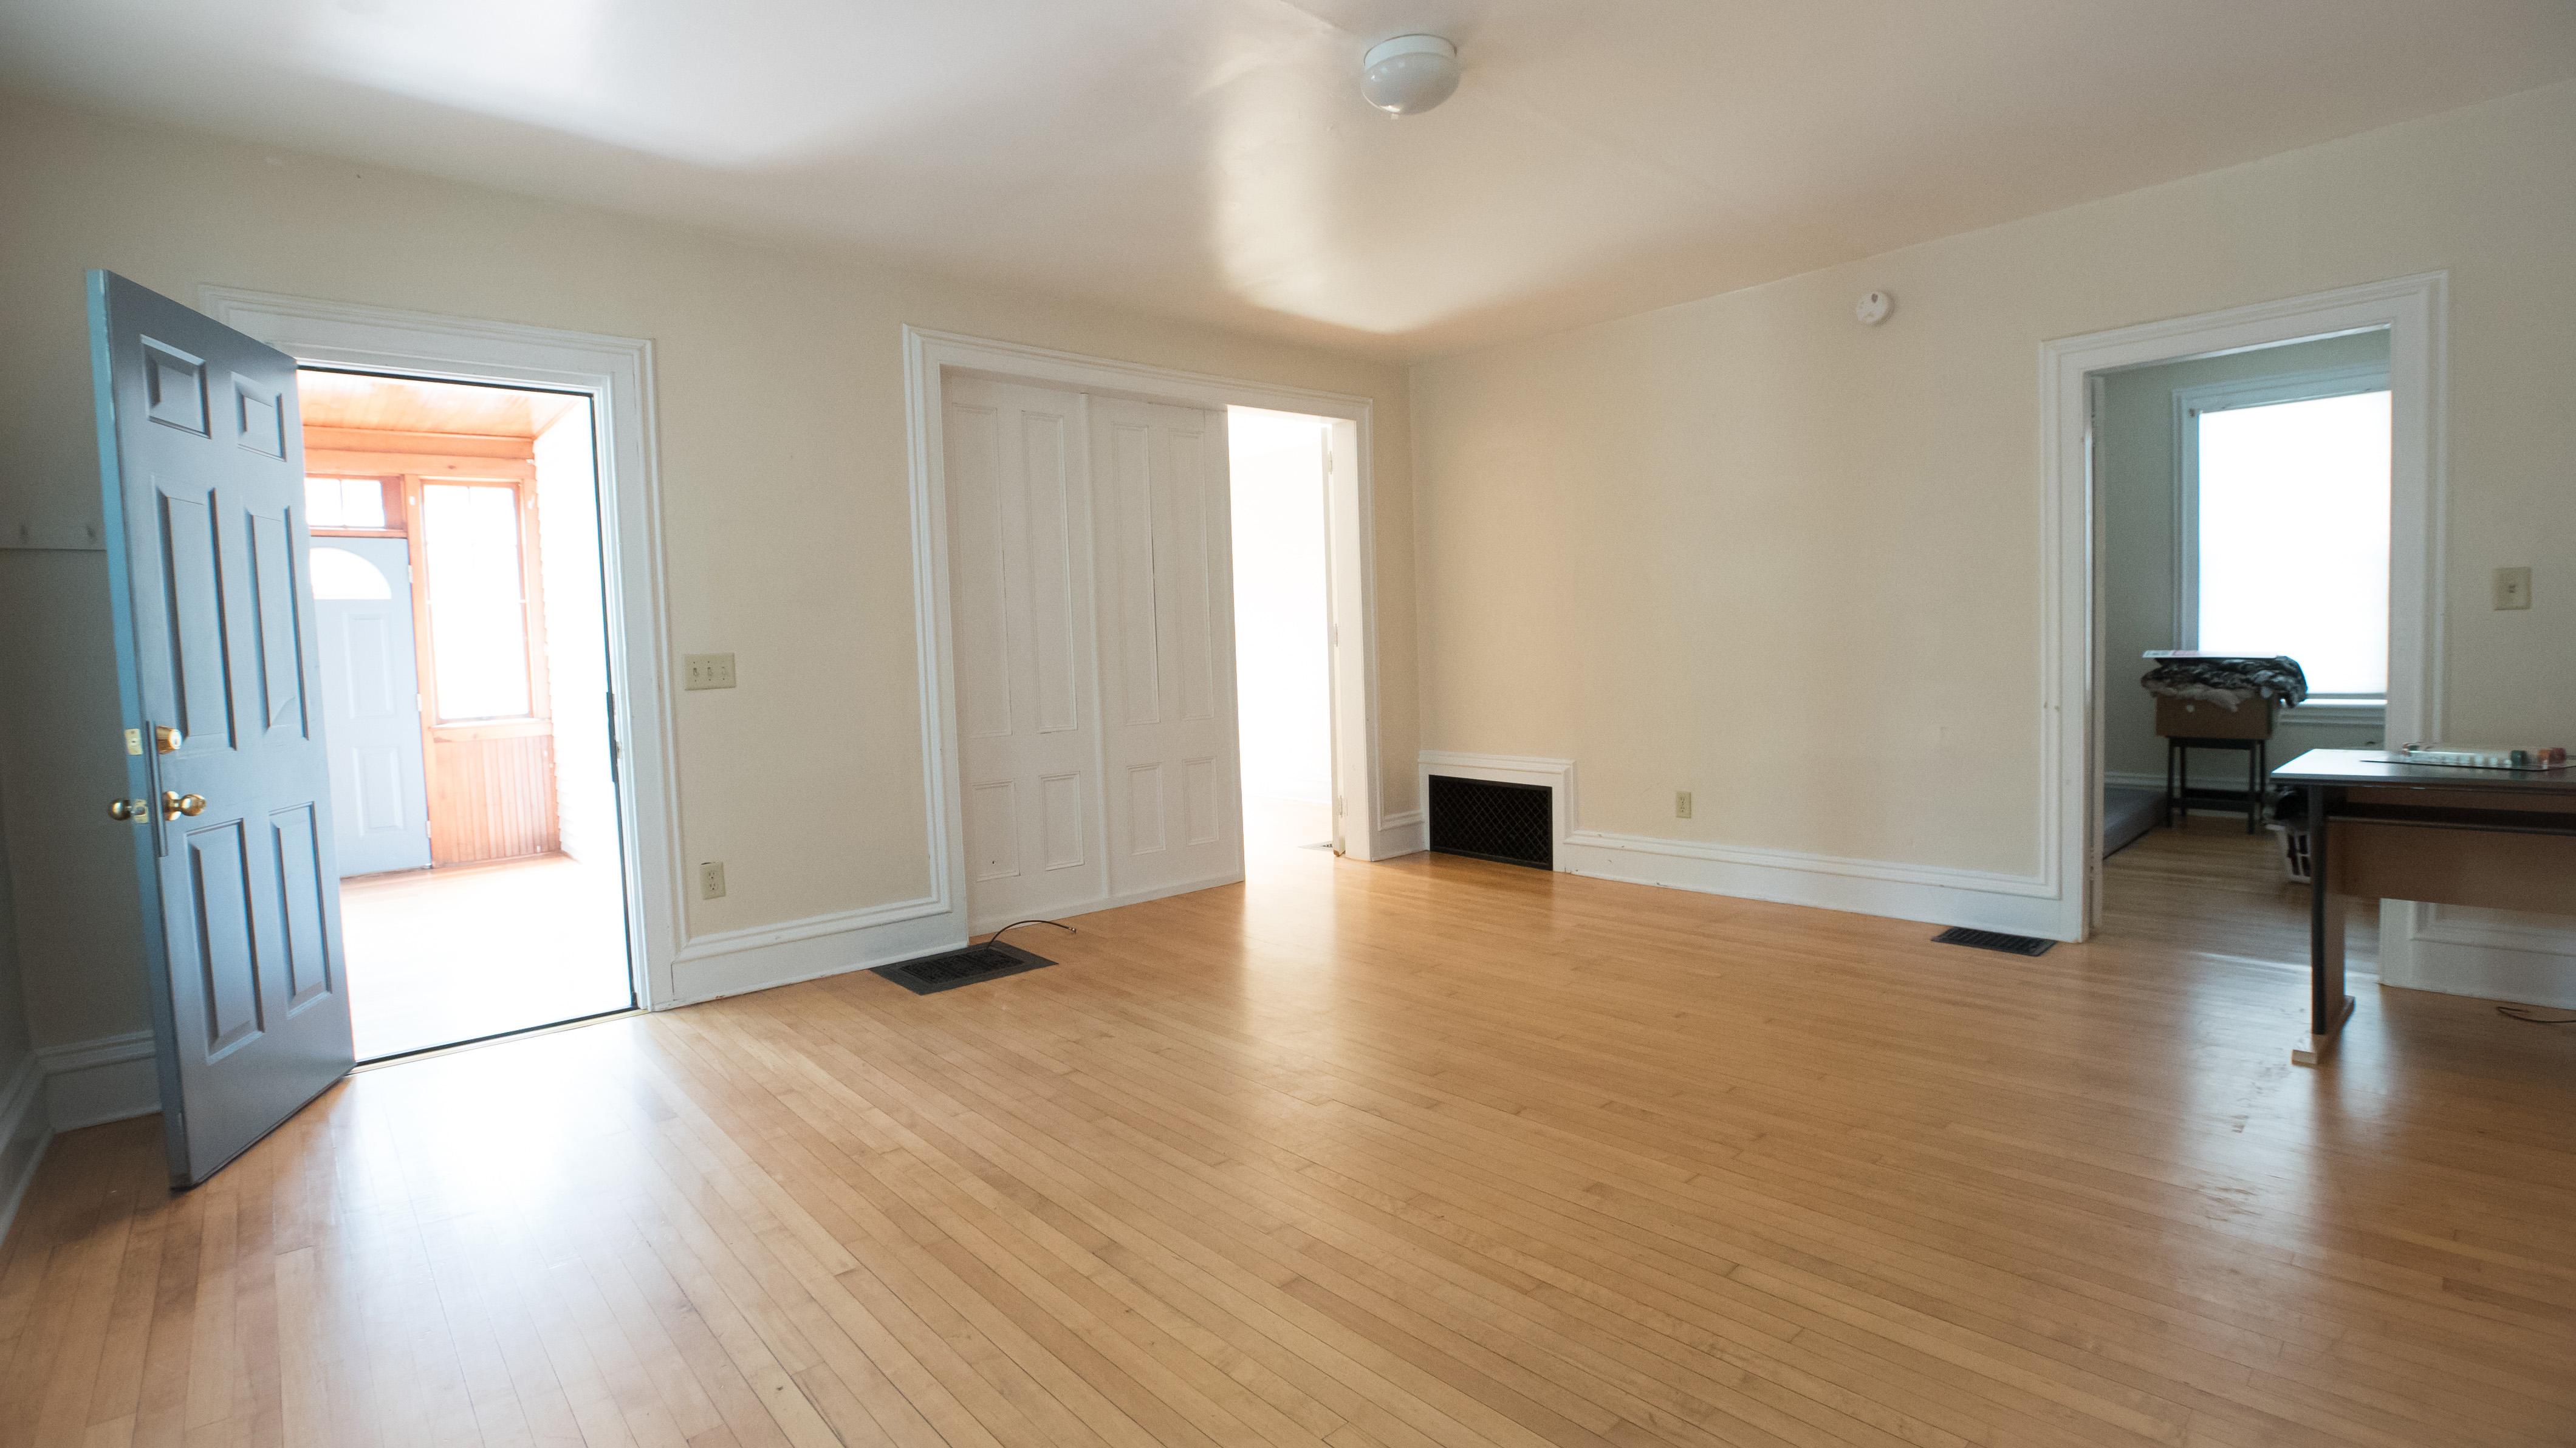 North union properties llc for Living room square feet